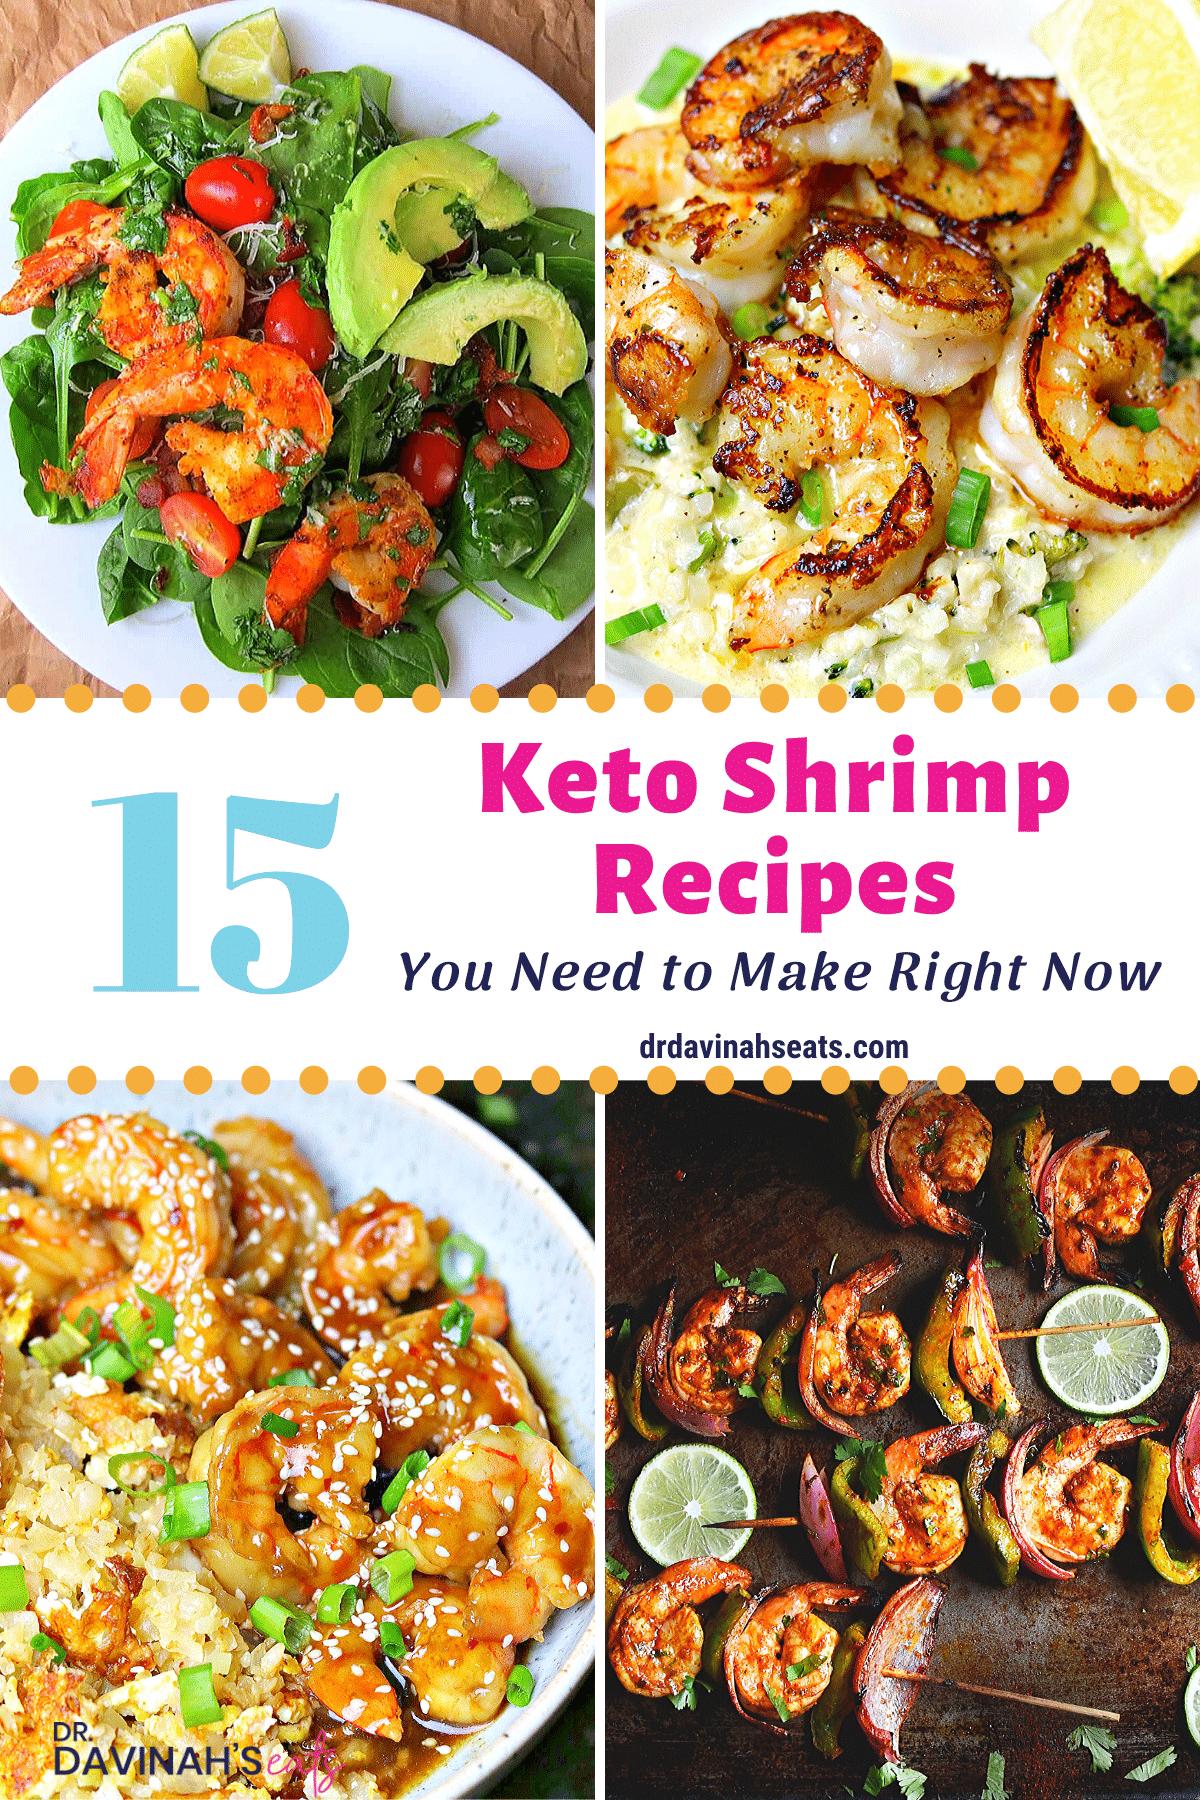 keto shrimp recipes pinterest image